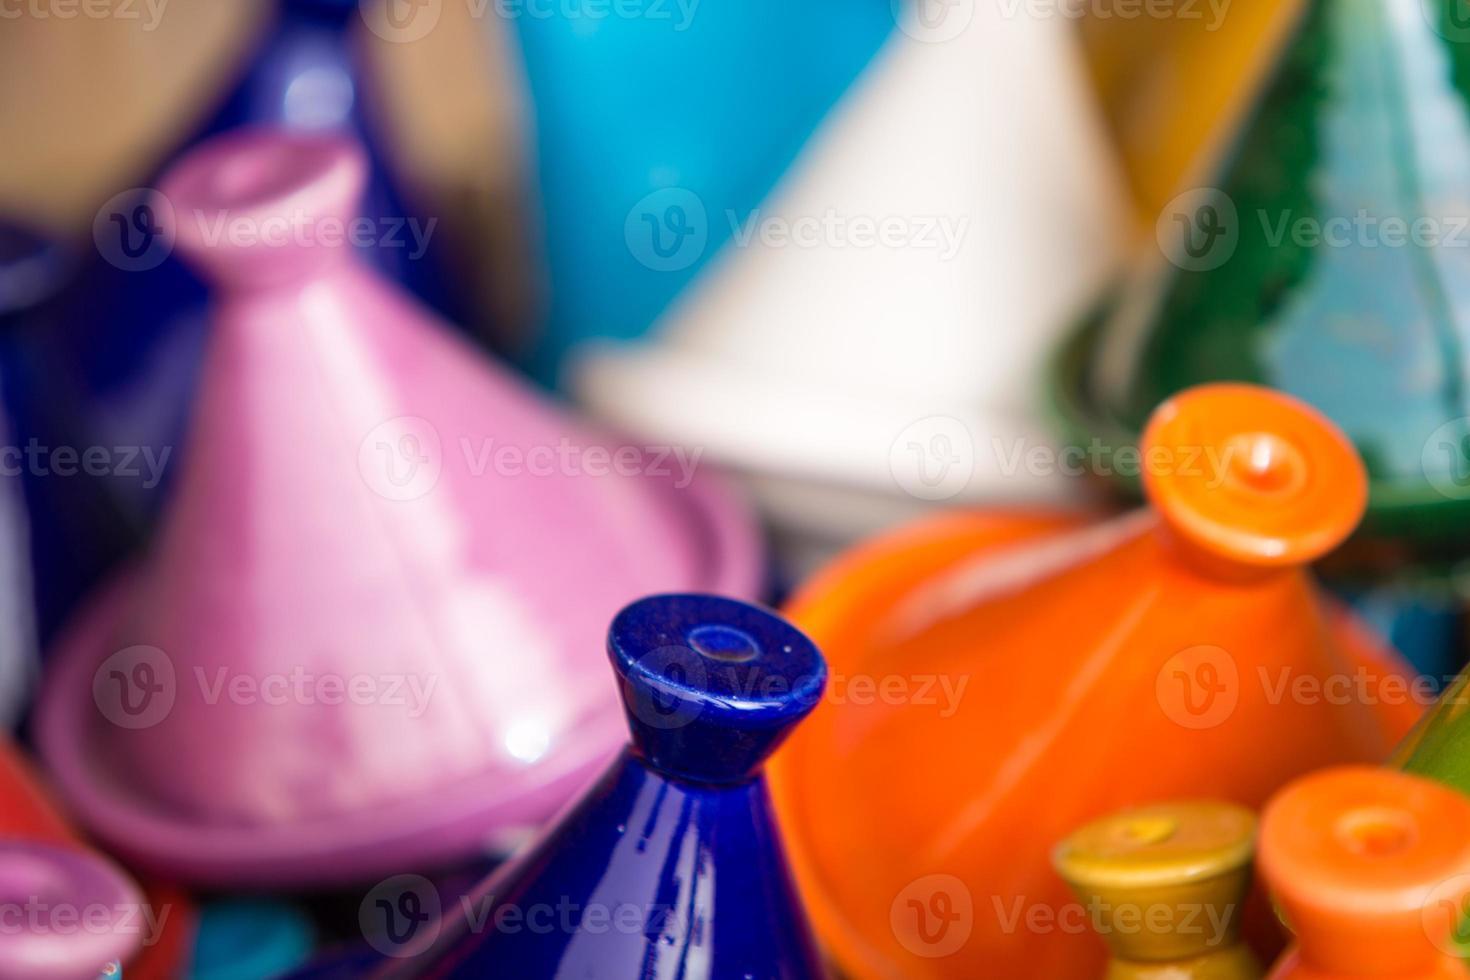 pequenos tajines coloridos em souk, tiznit foto